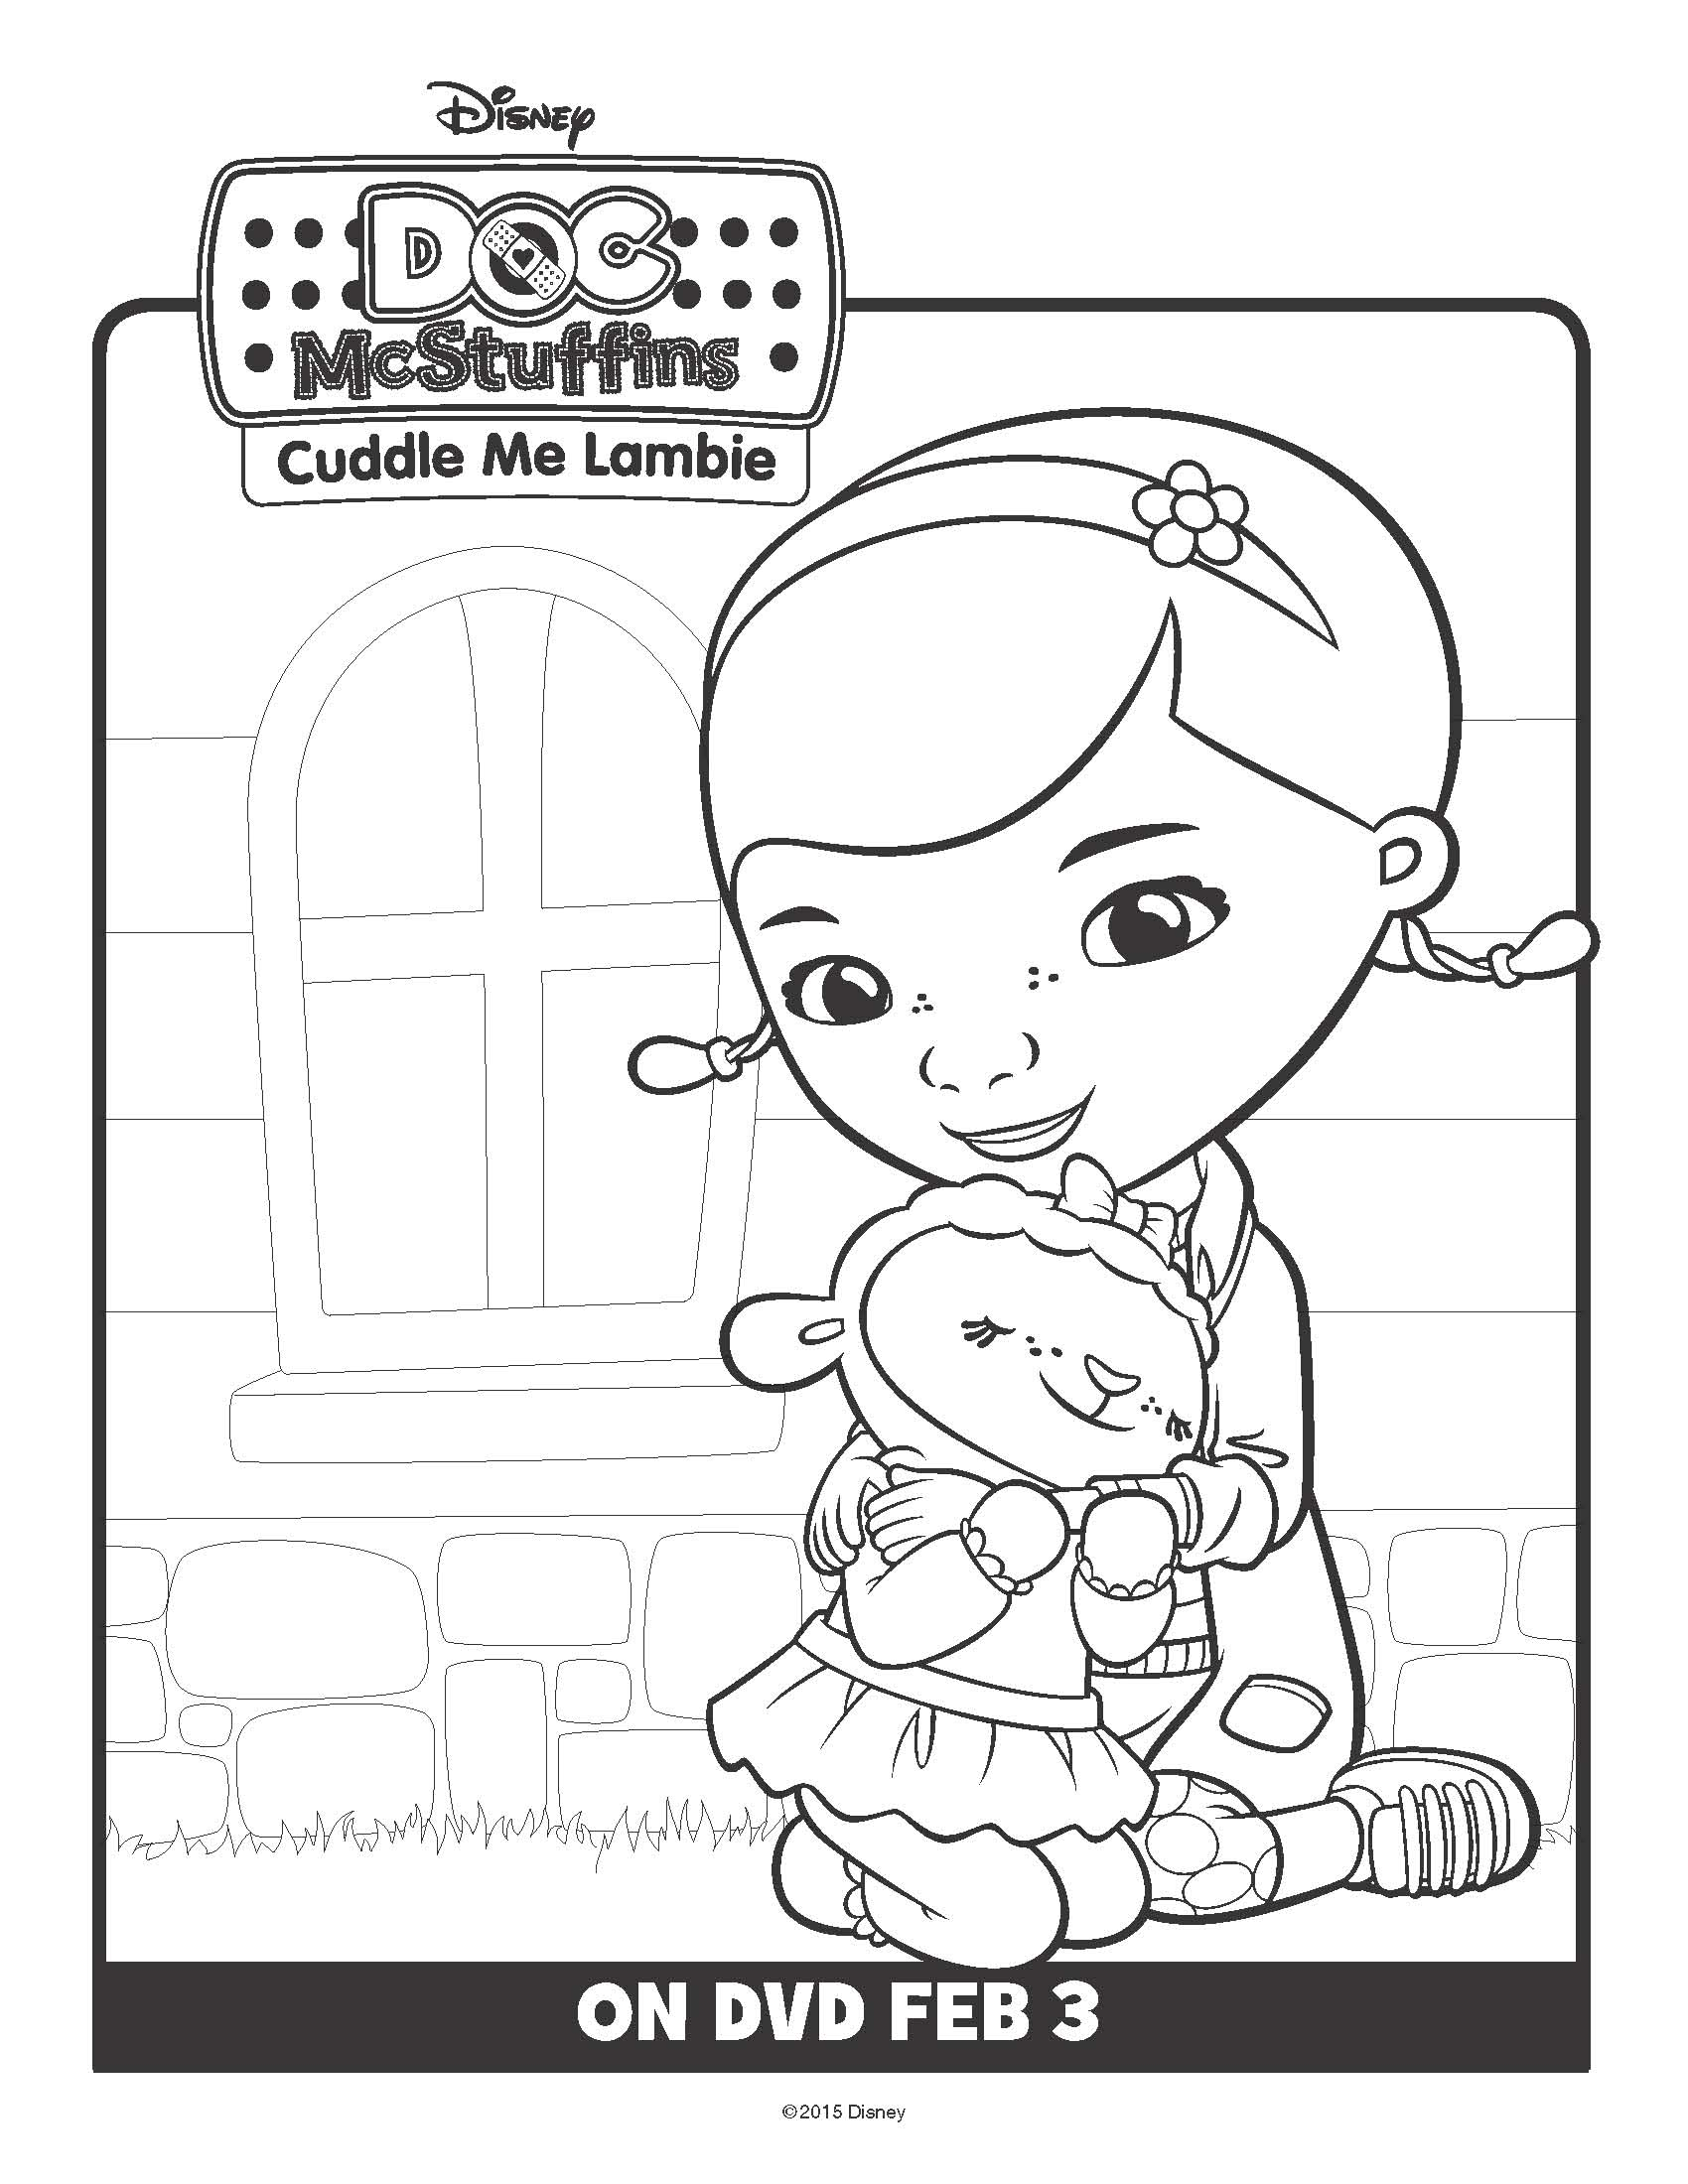 Doc McStuffins: Cuddle Me Lambie! on DVD February 3! Free